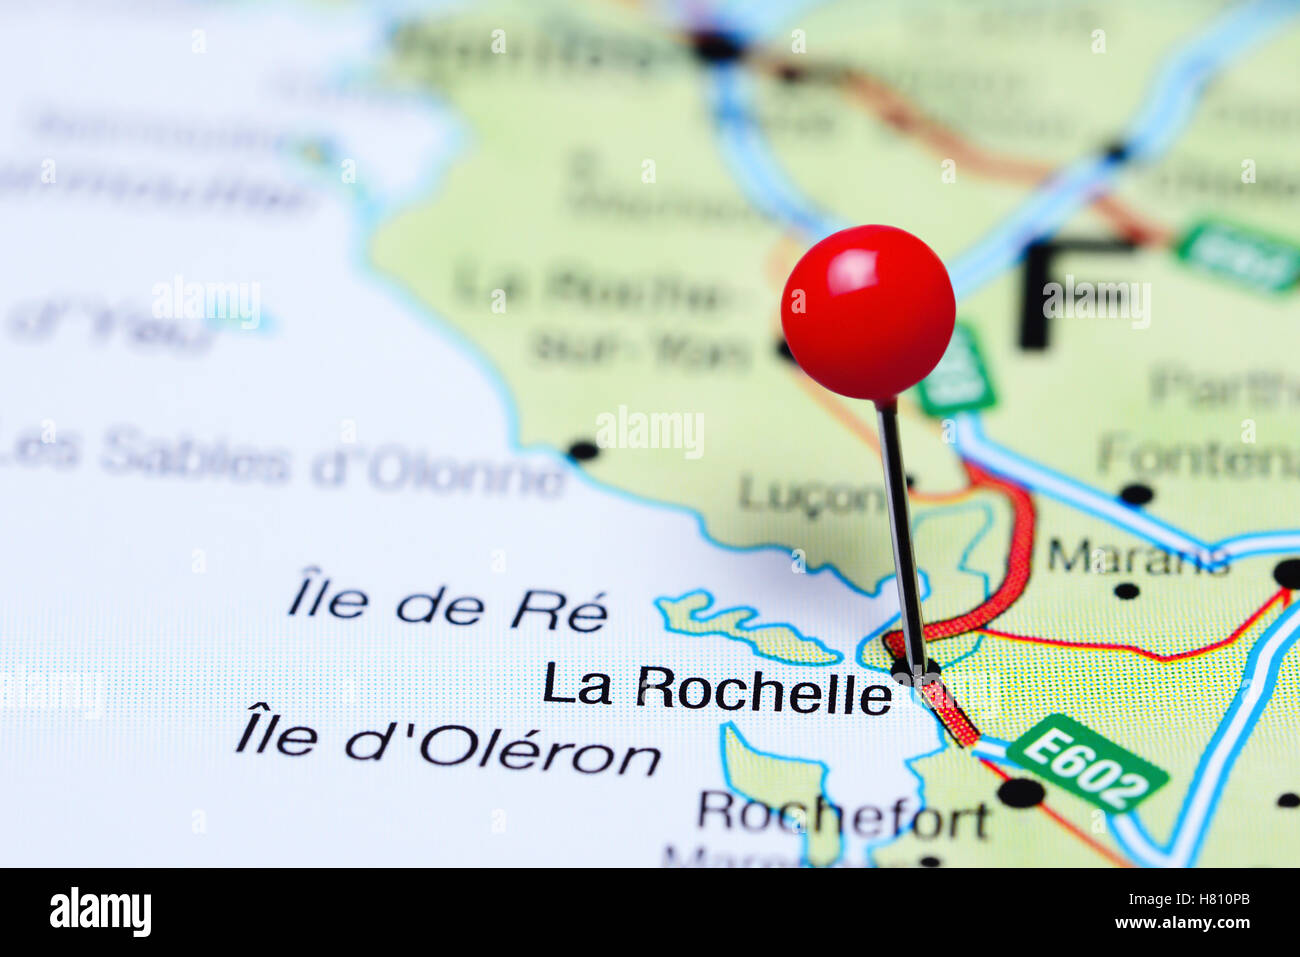 Map Of France La Rochelle.La Rochelle Pinned On A Map Of France Stock Photo 125412403 Alamy